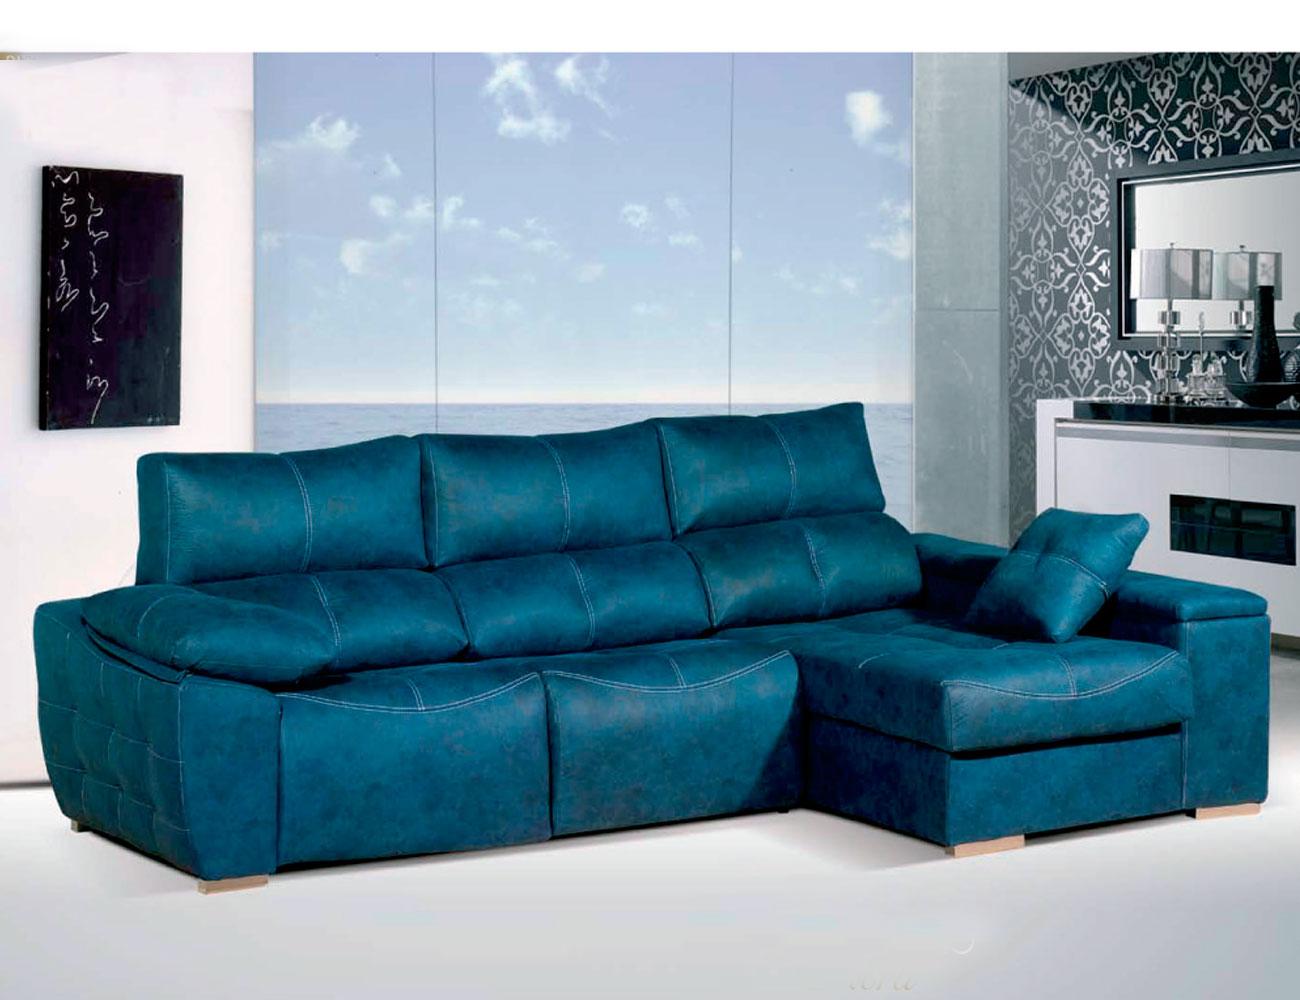 Sofa chaiselongue relax 2 motores anti manchas turquesa11